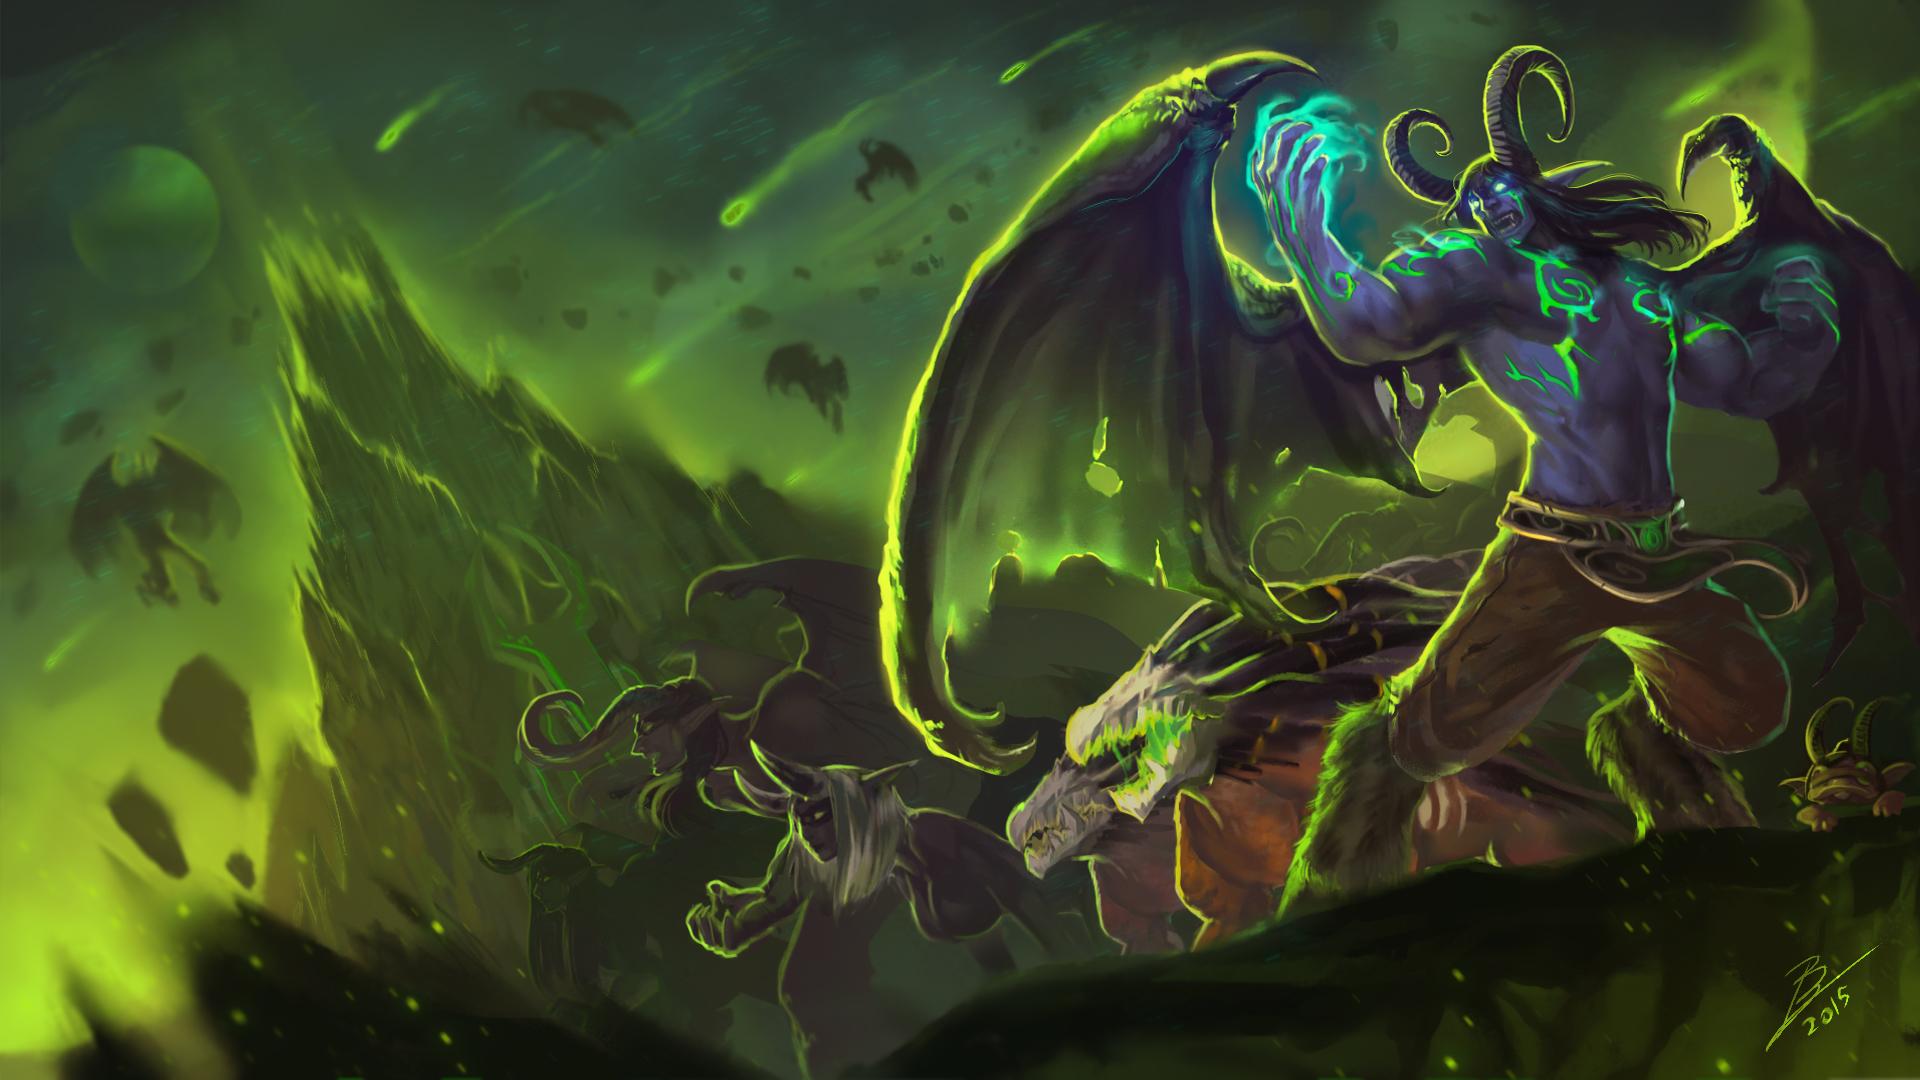 Download Wallpaper The Demon Wow World Of Warcraft Legion